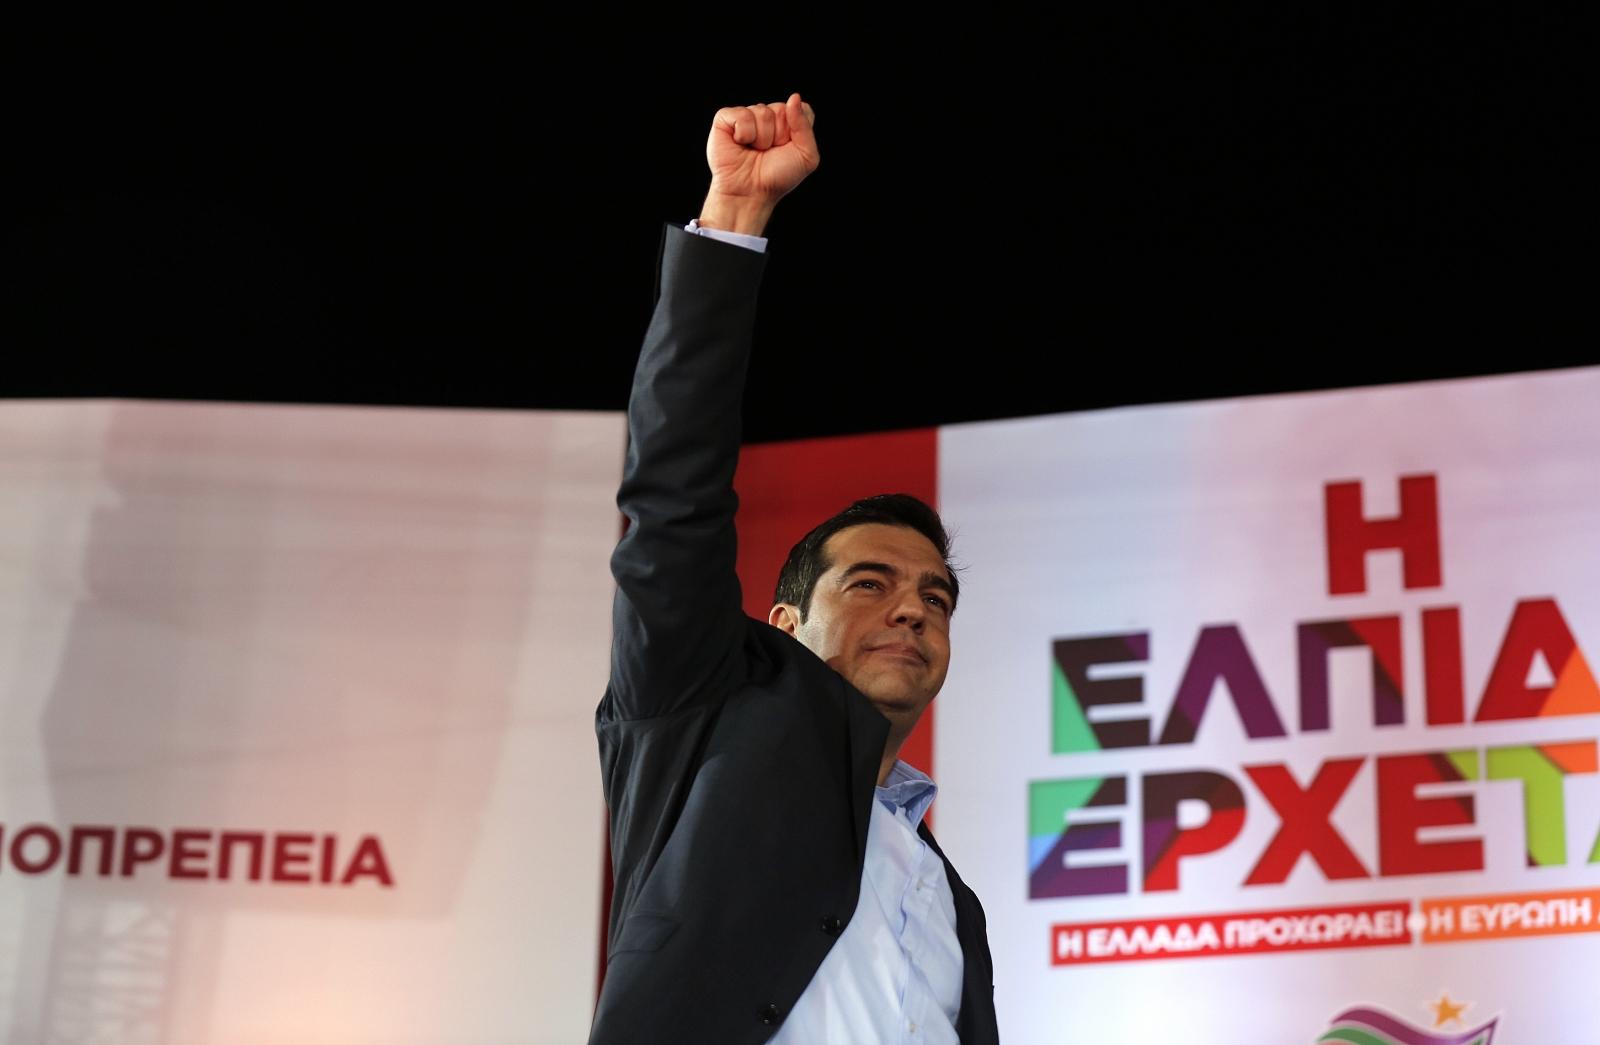 Rradical leftist Syriza party Alexis Tsipras